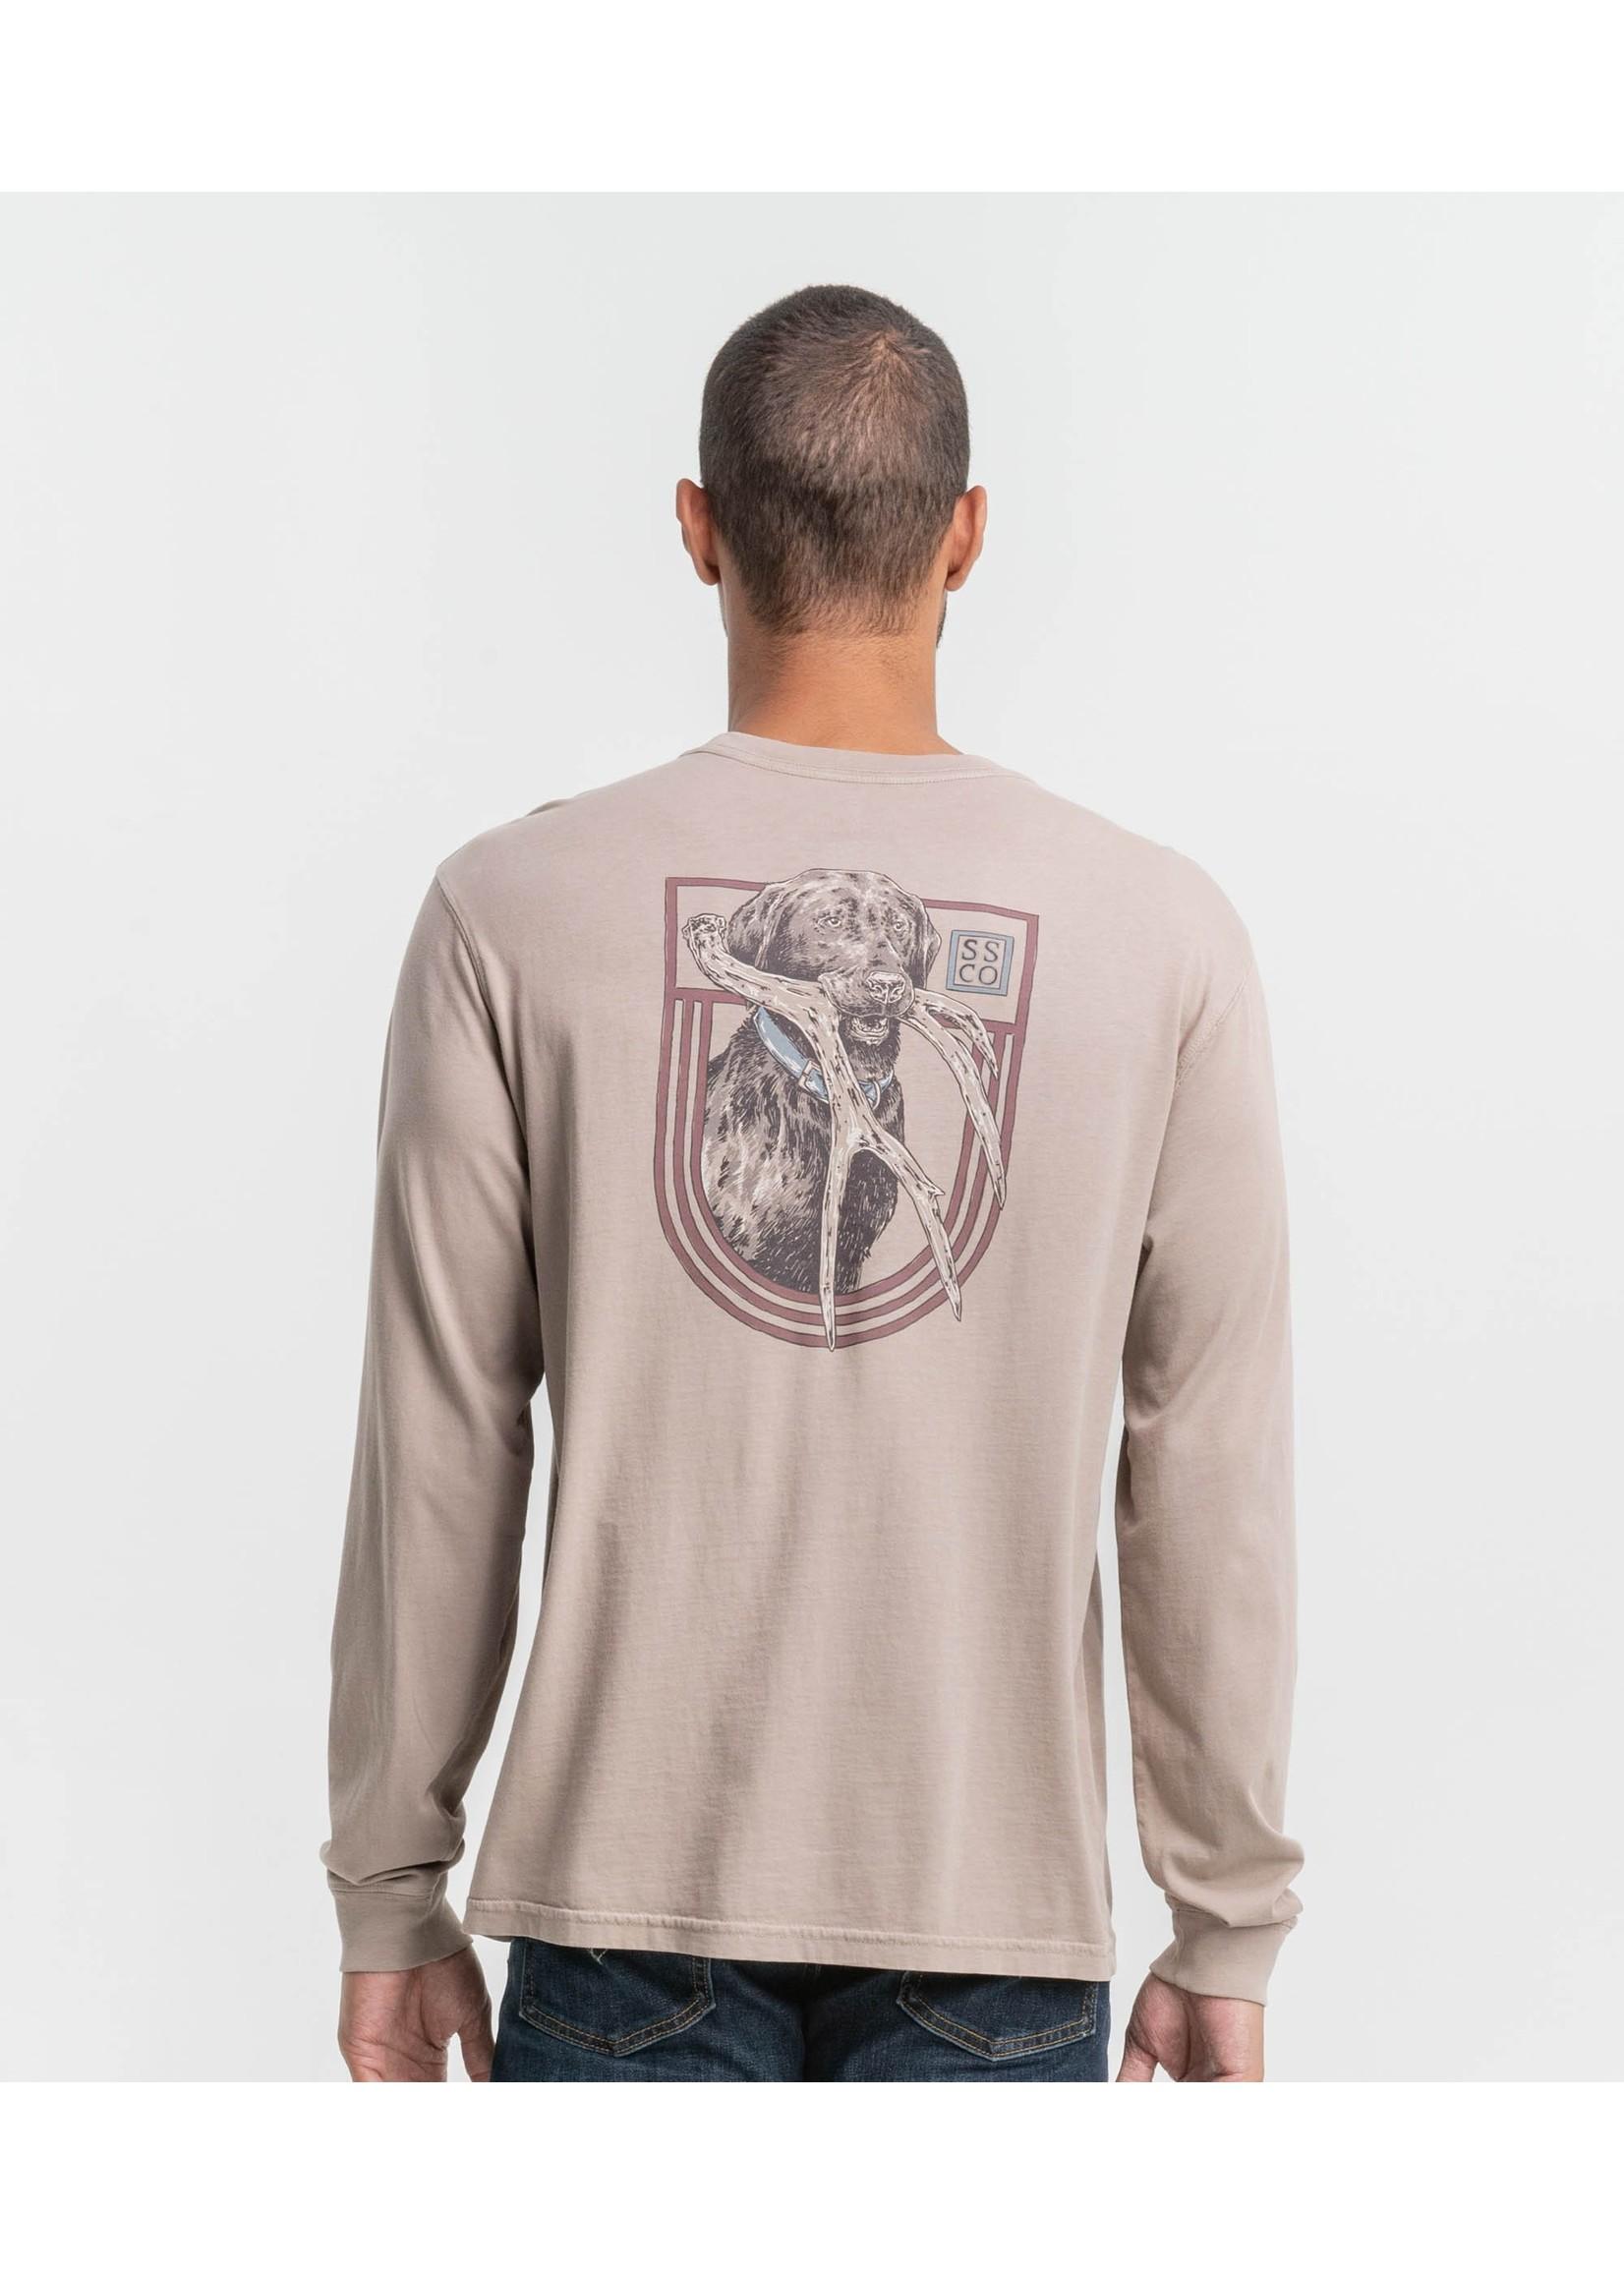 Southern Shirt Antler Shed Lab Tee